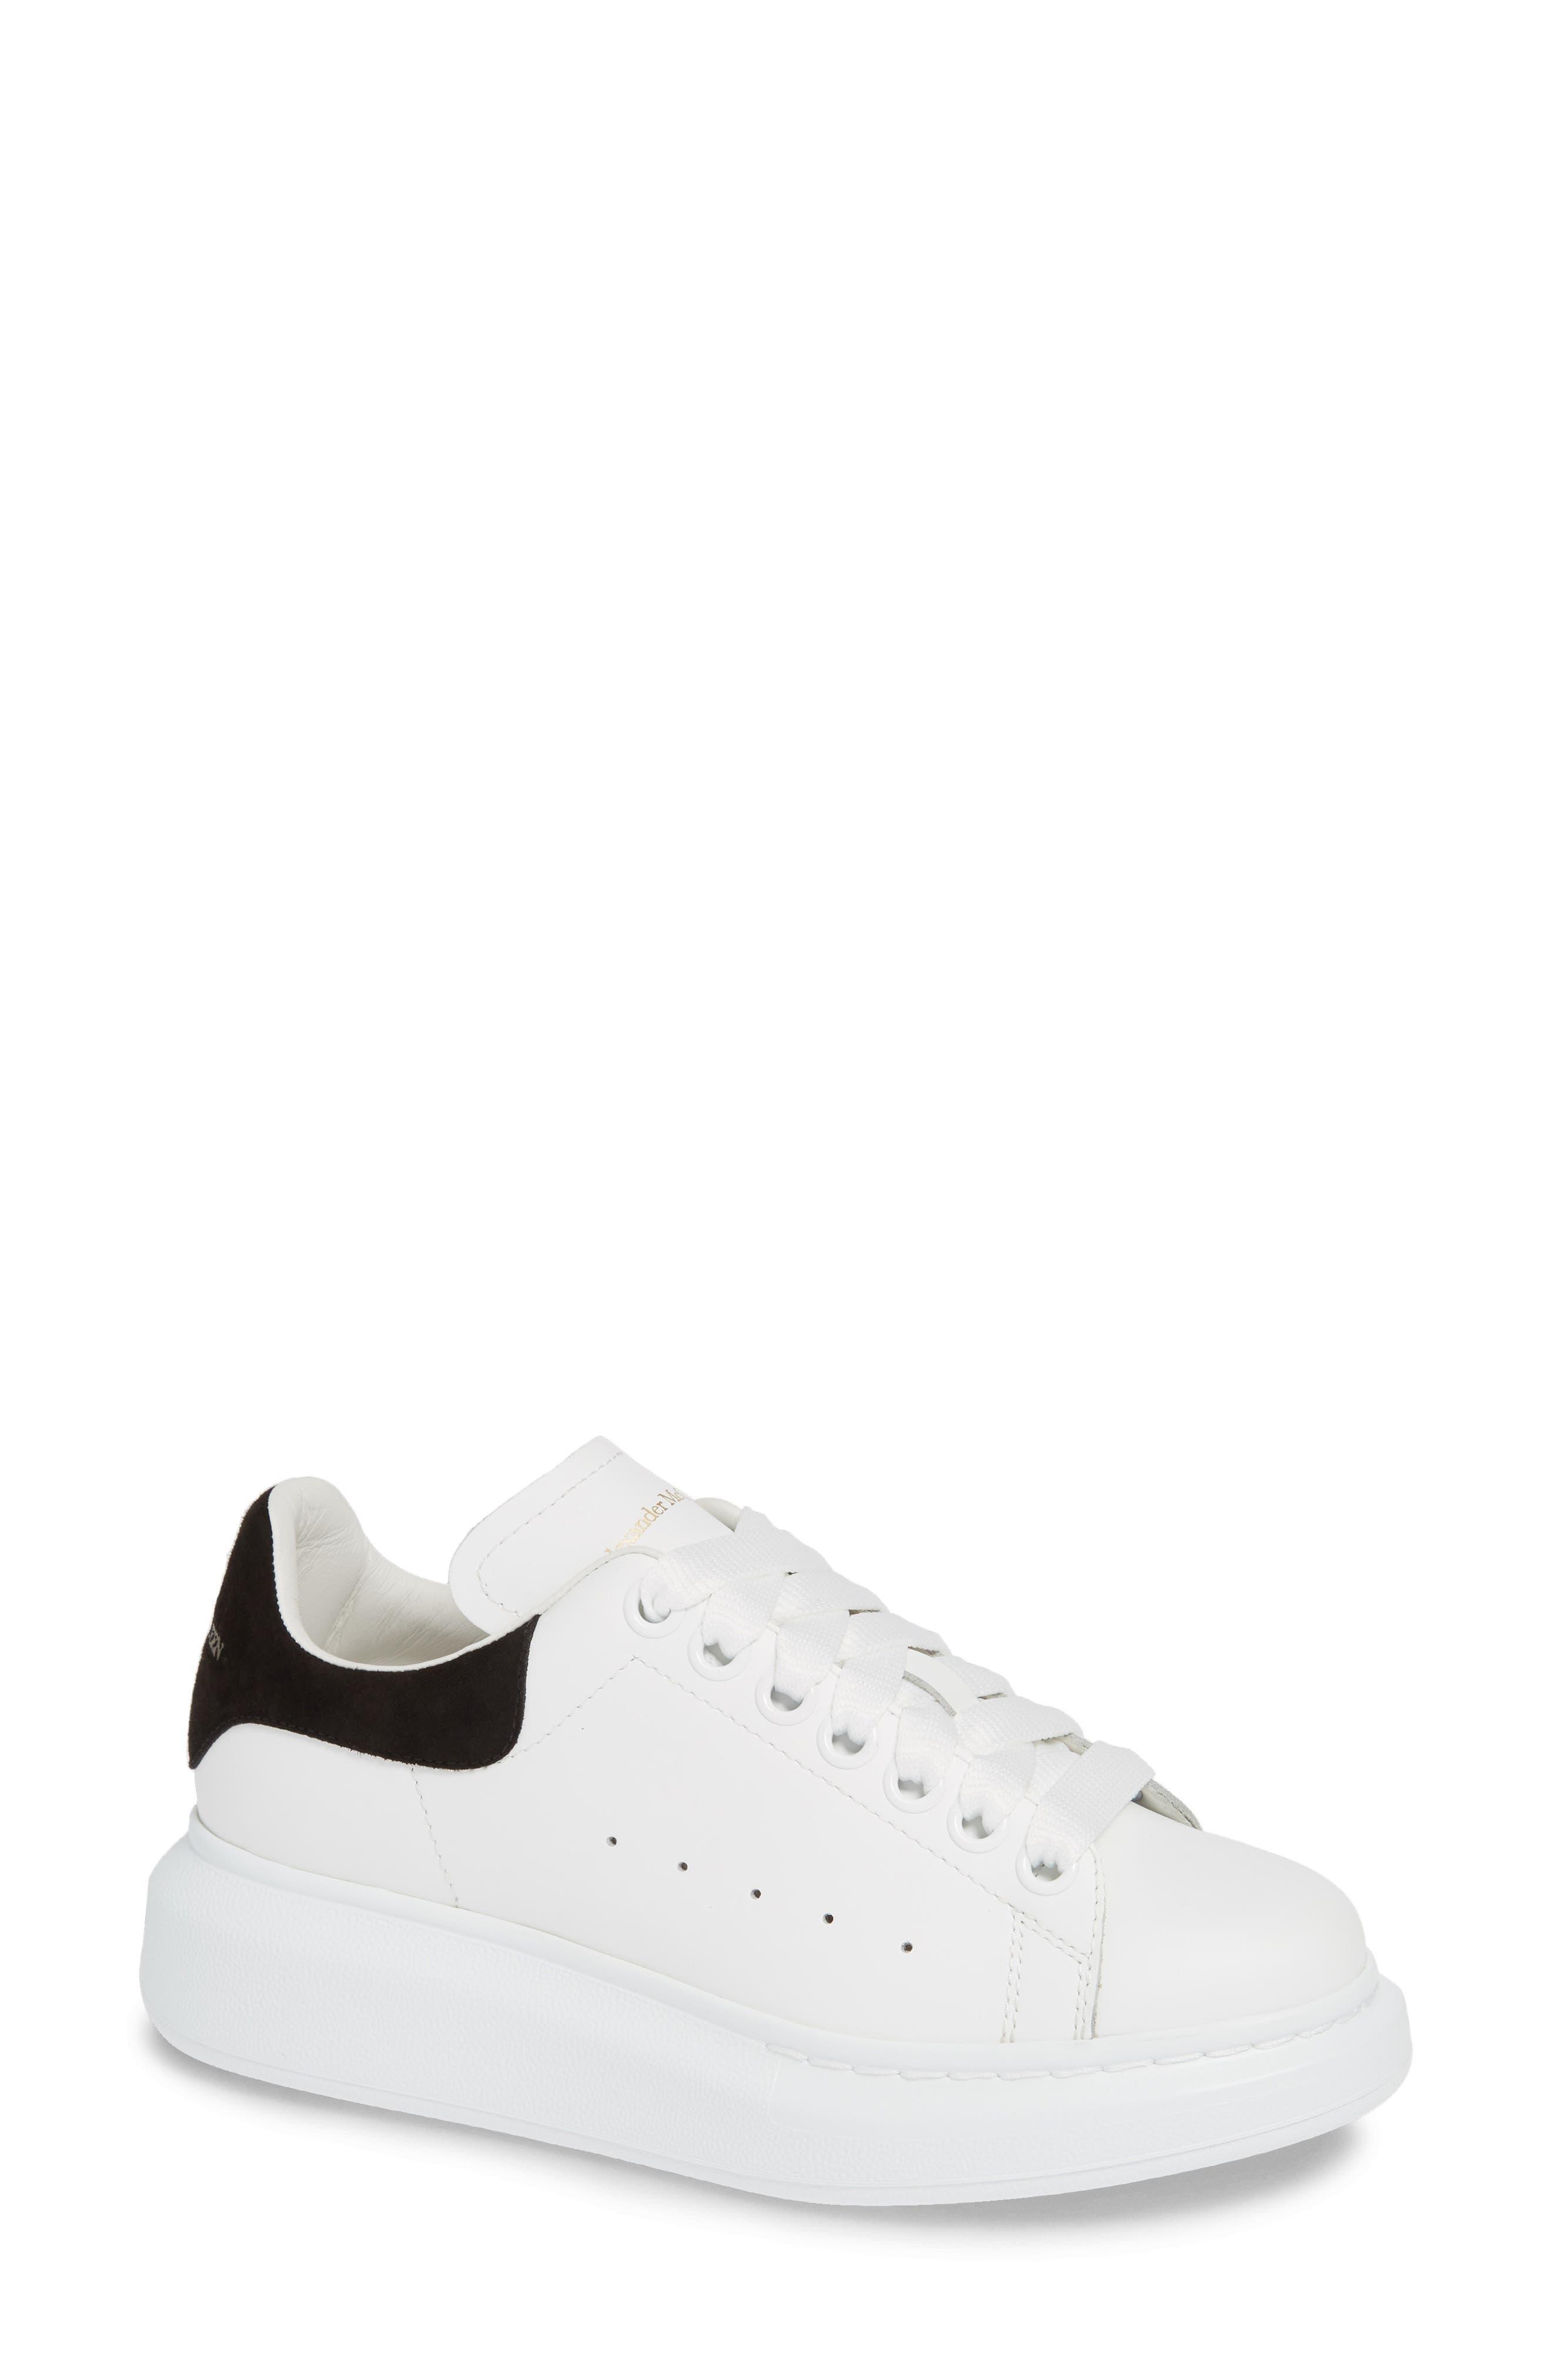 ALEXANDER MCQUEEN Sneaker, Main, color, WHITE BLACK